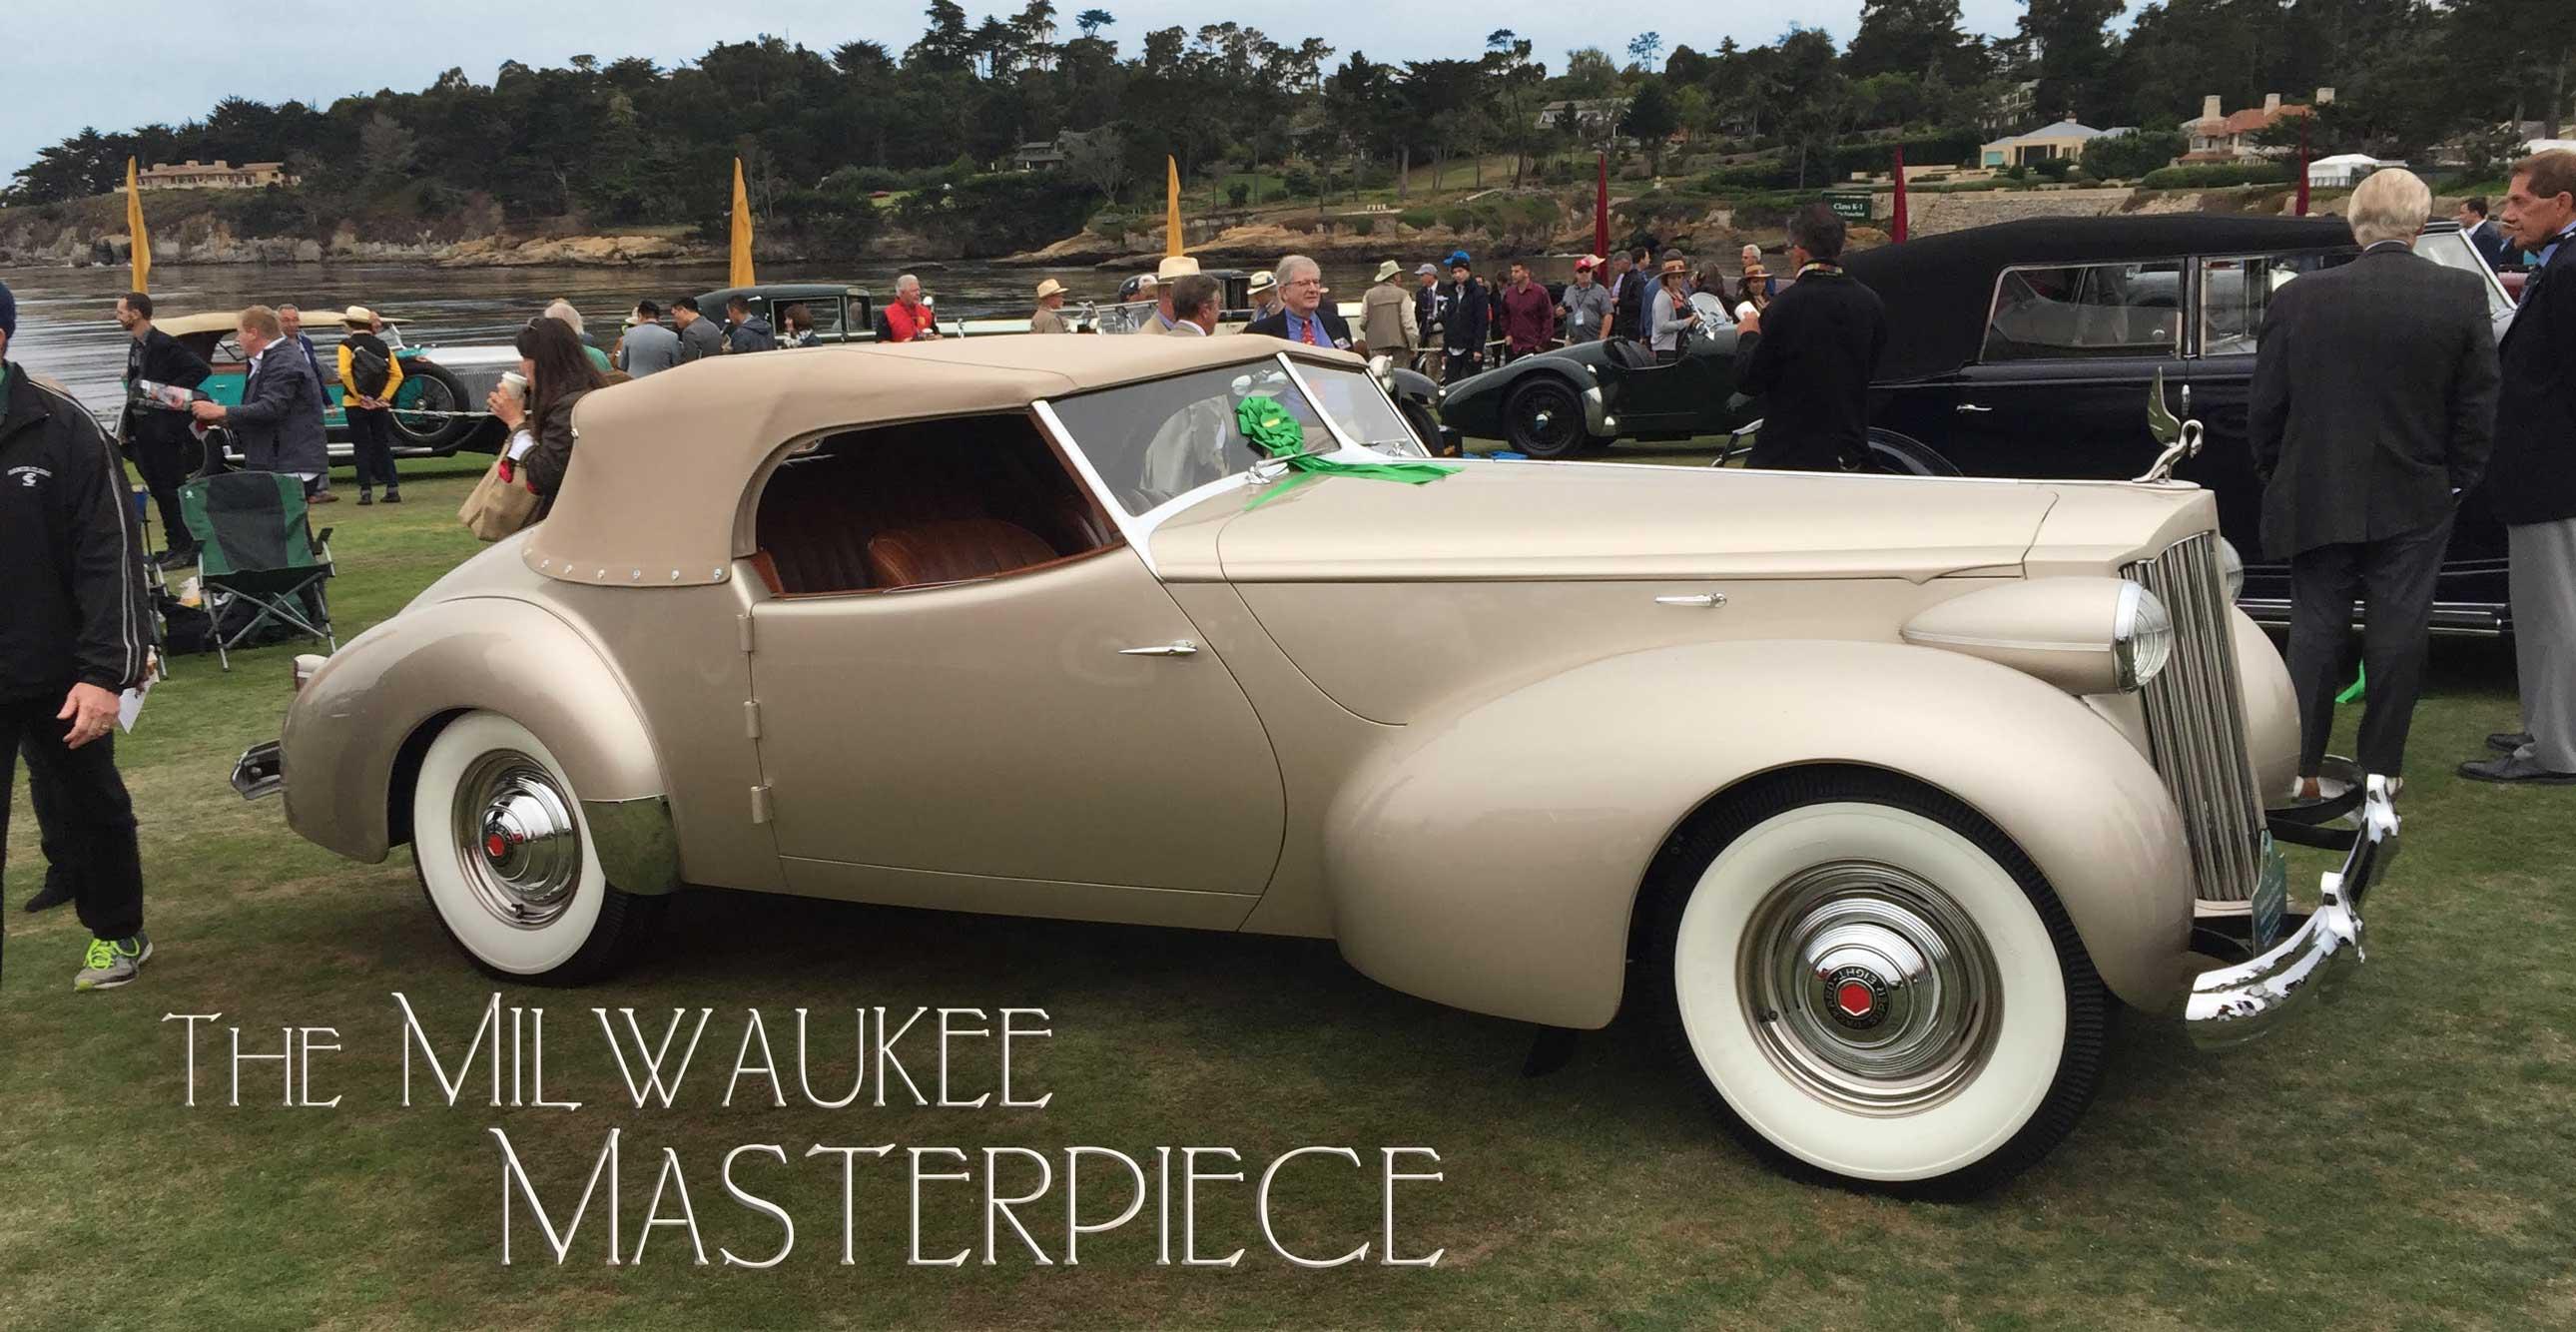 1939 Packard 1703 Super-8 Darrin Convertible Victoria | Pebble Beach Winner | The Milwaukee Masterpiece